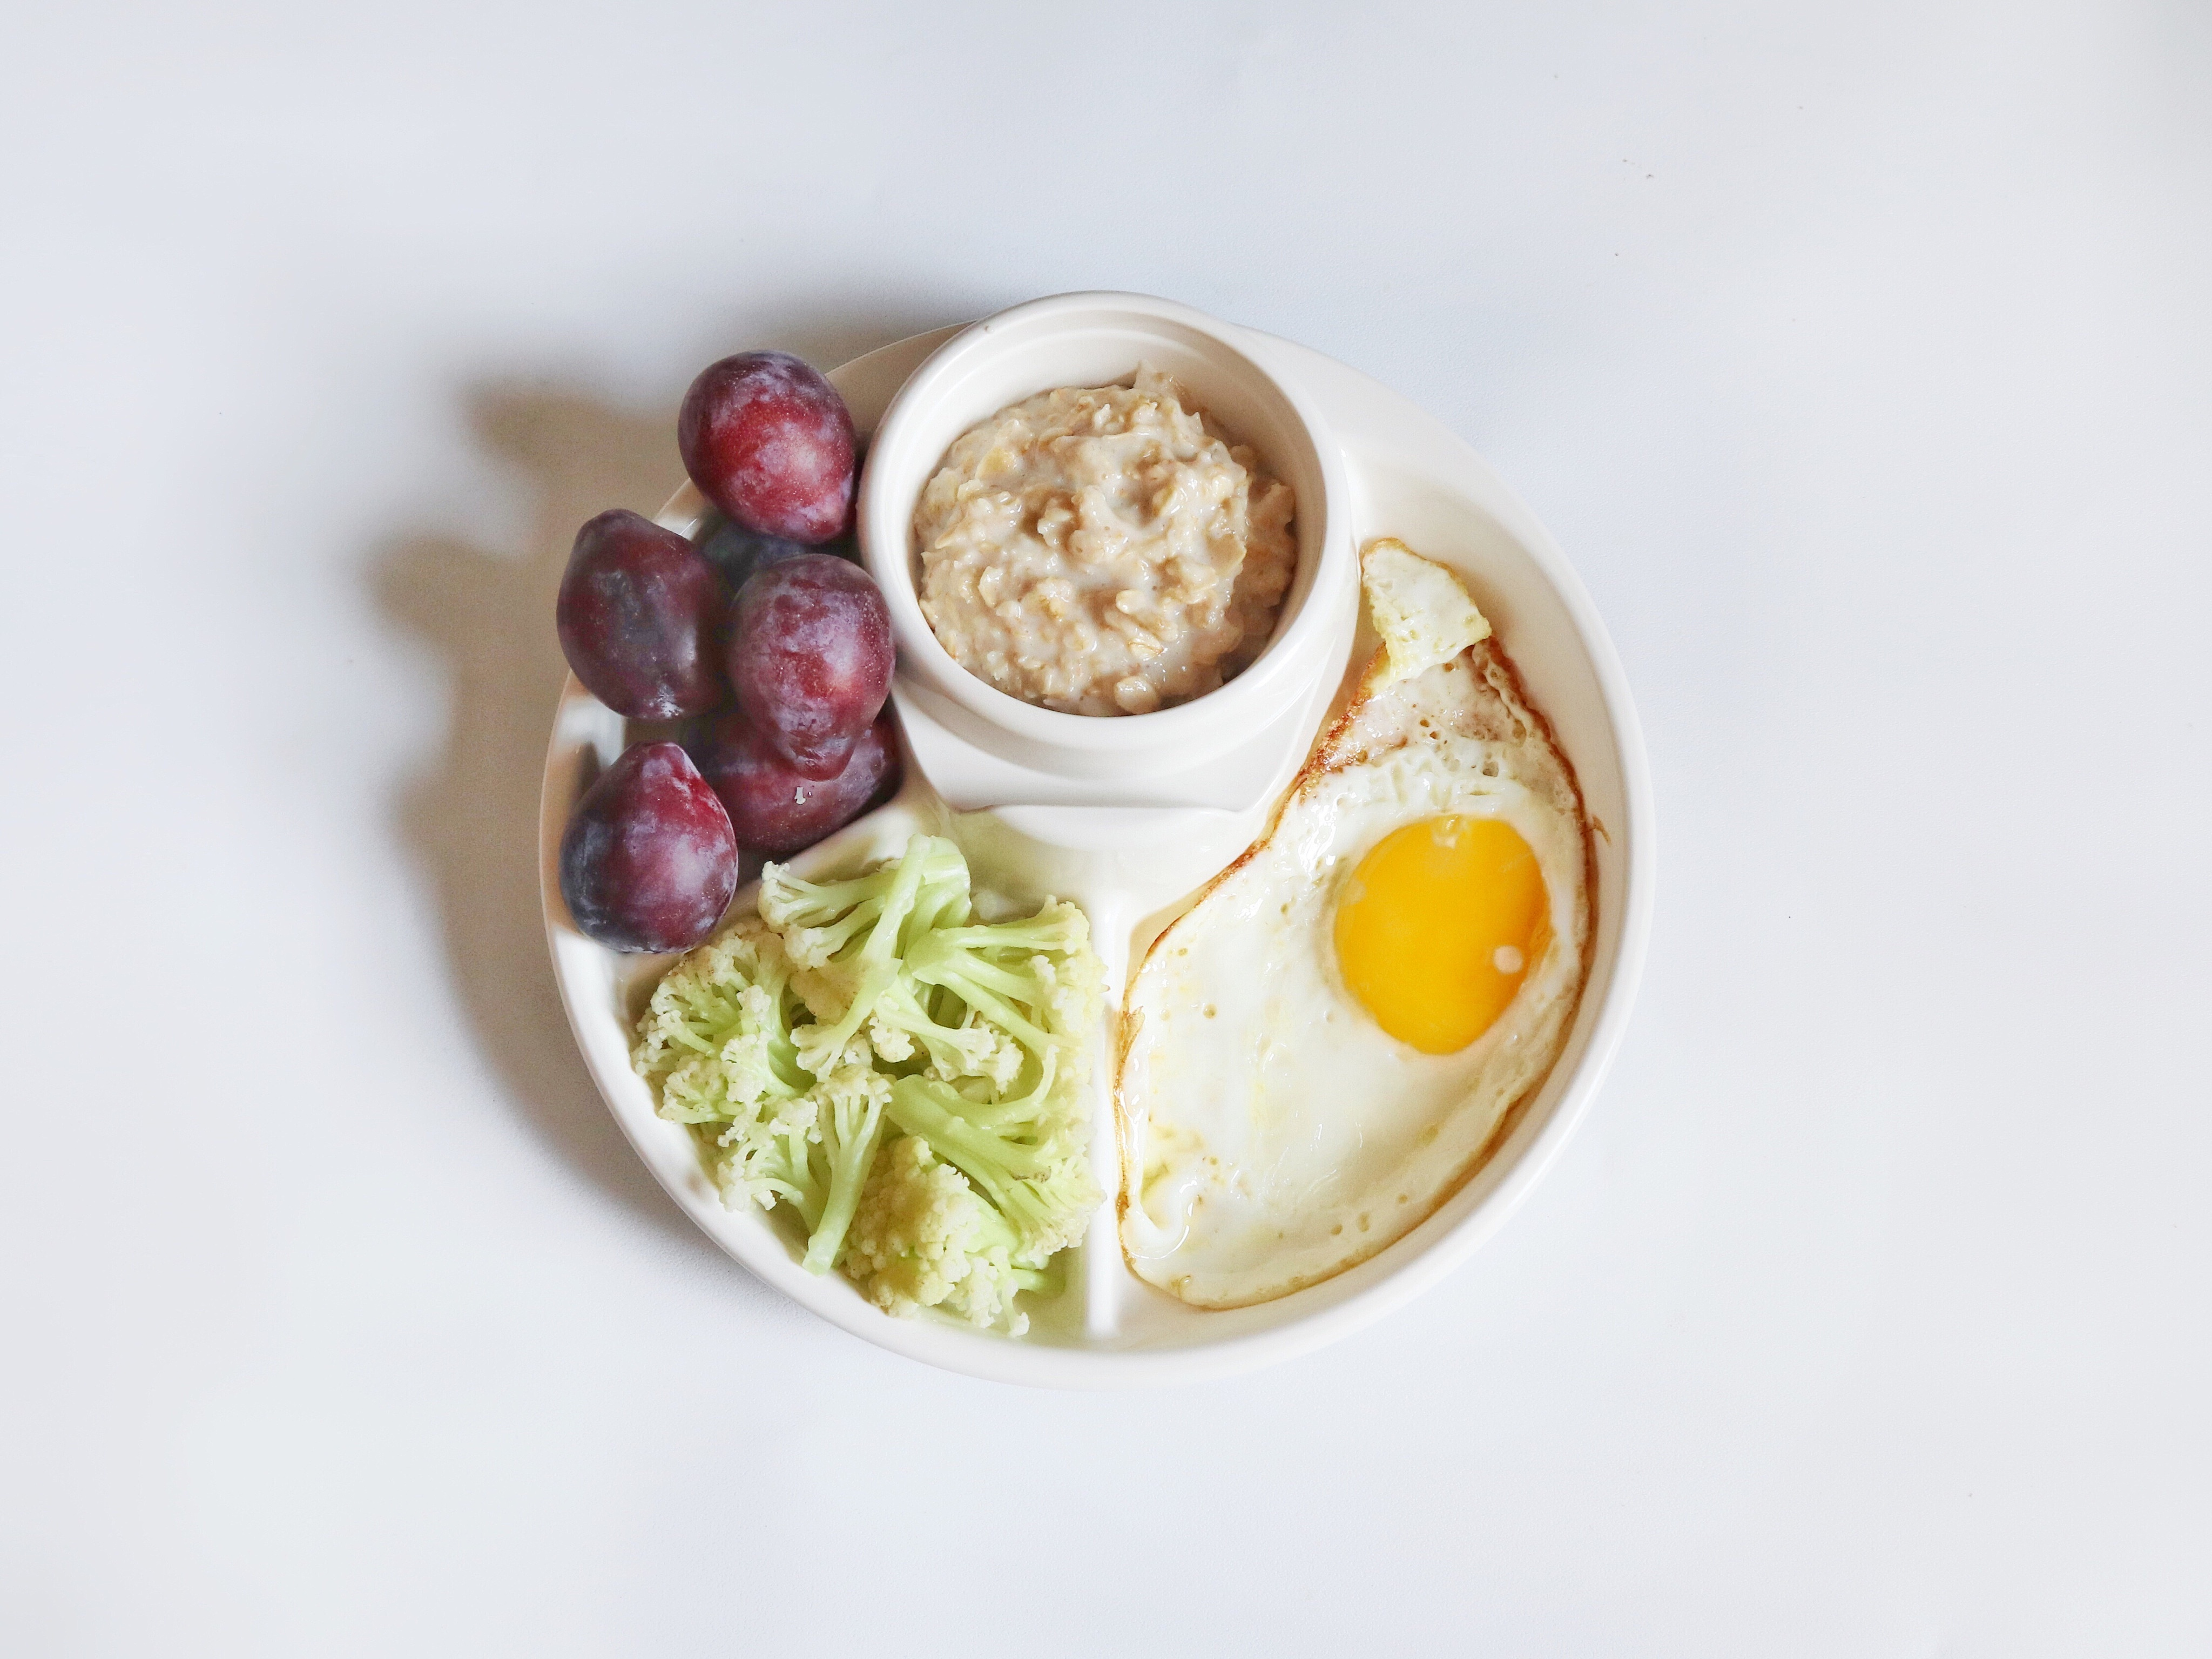 ㊙️一周减脂早餐 简单料理 低卡又健康的做法 步骤4